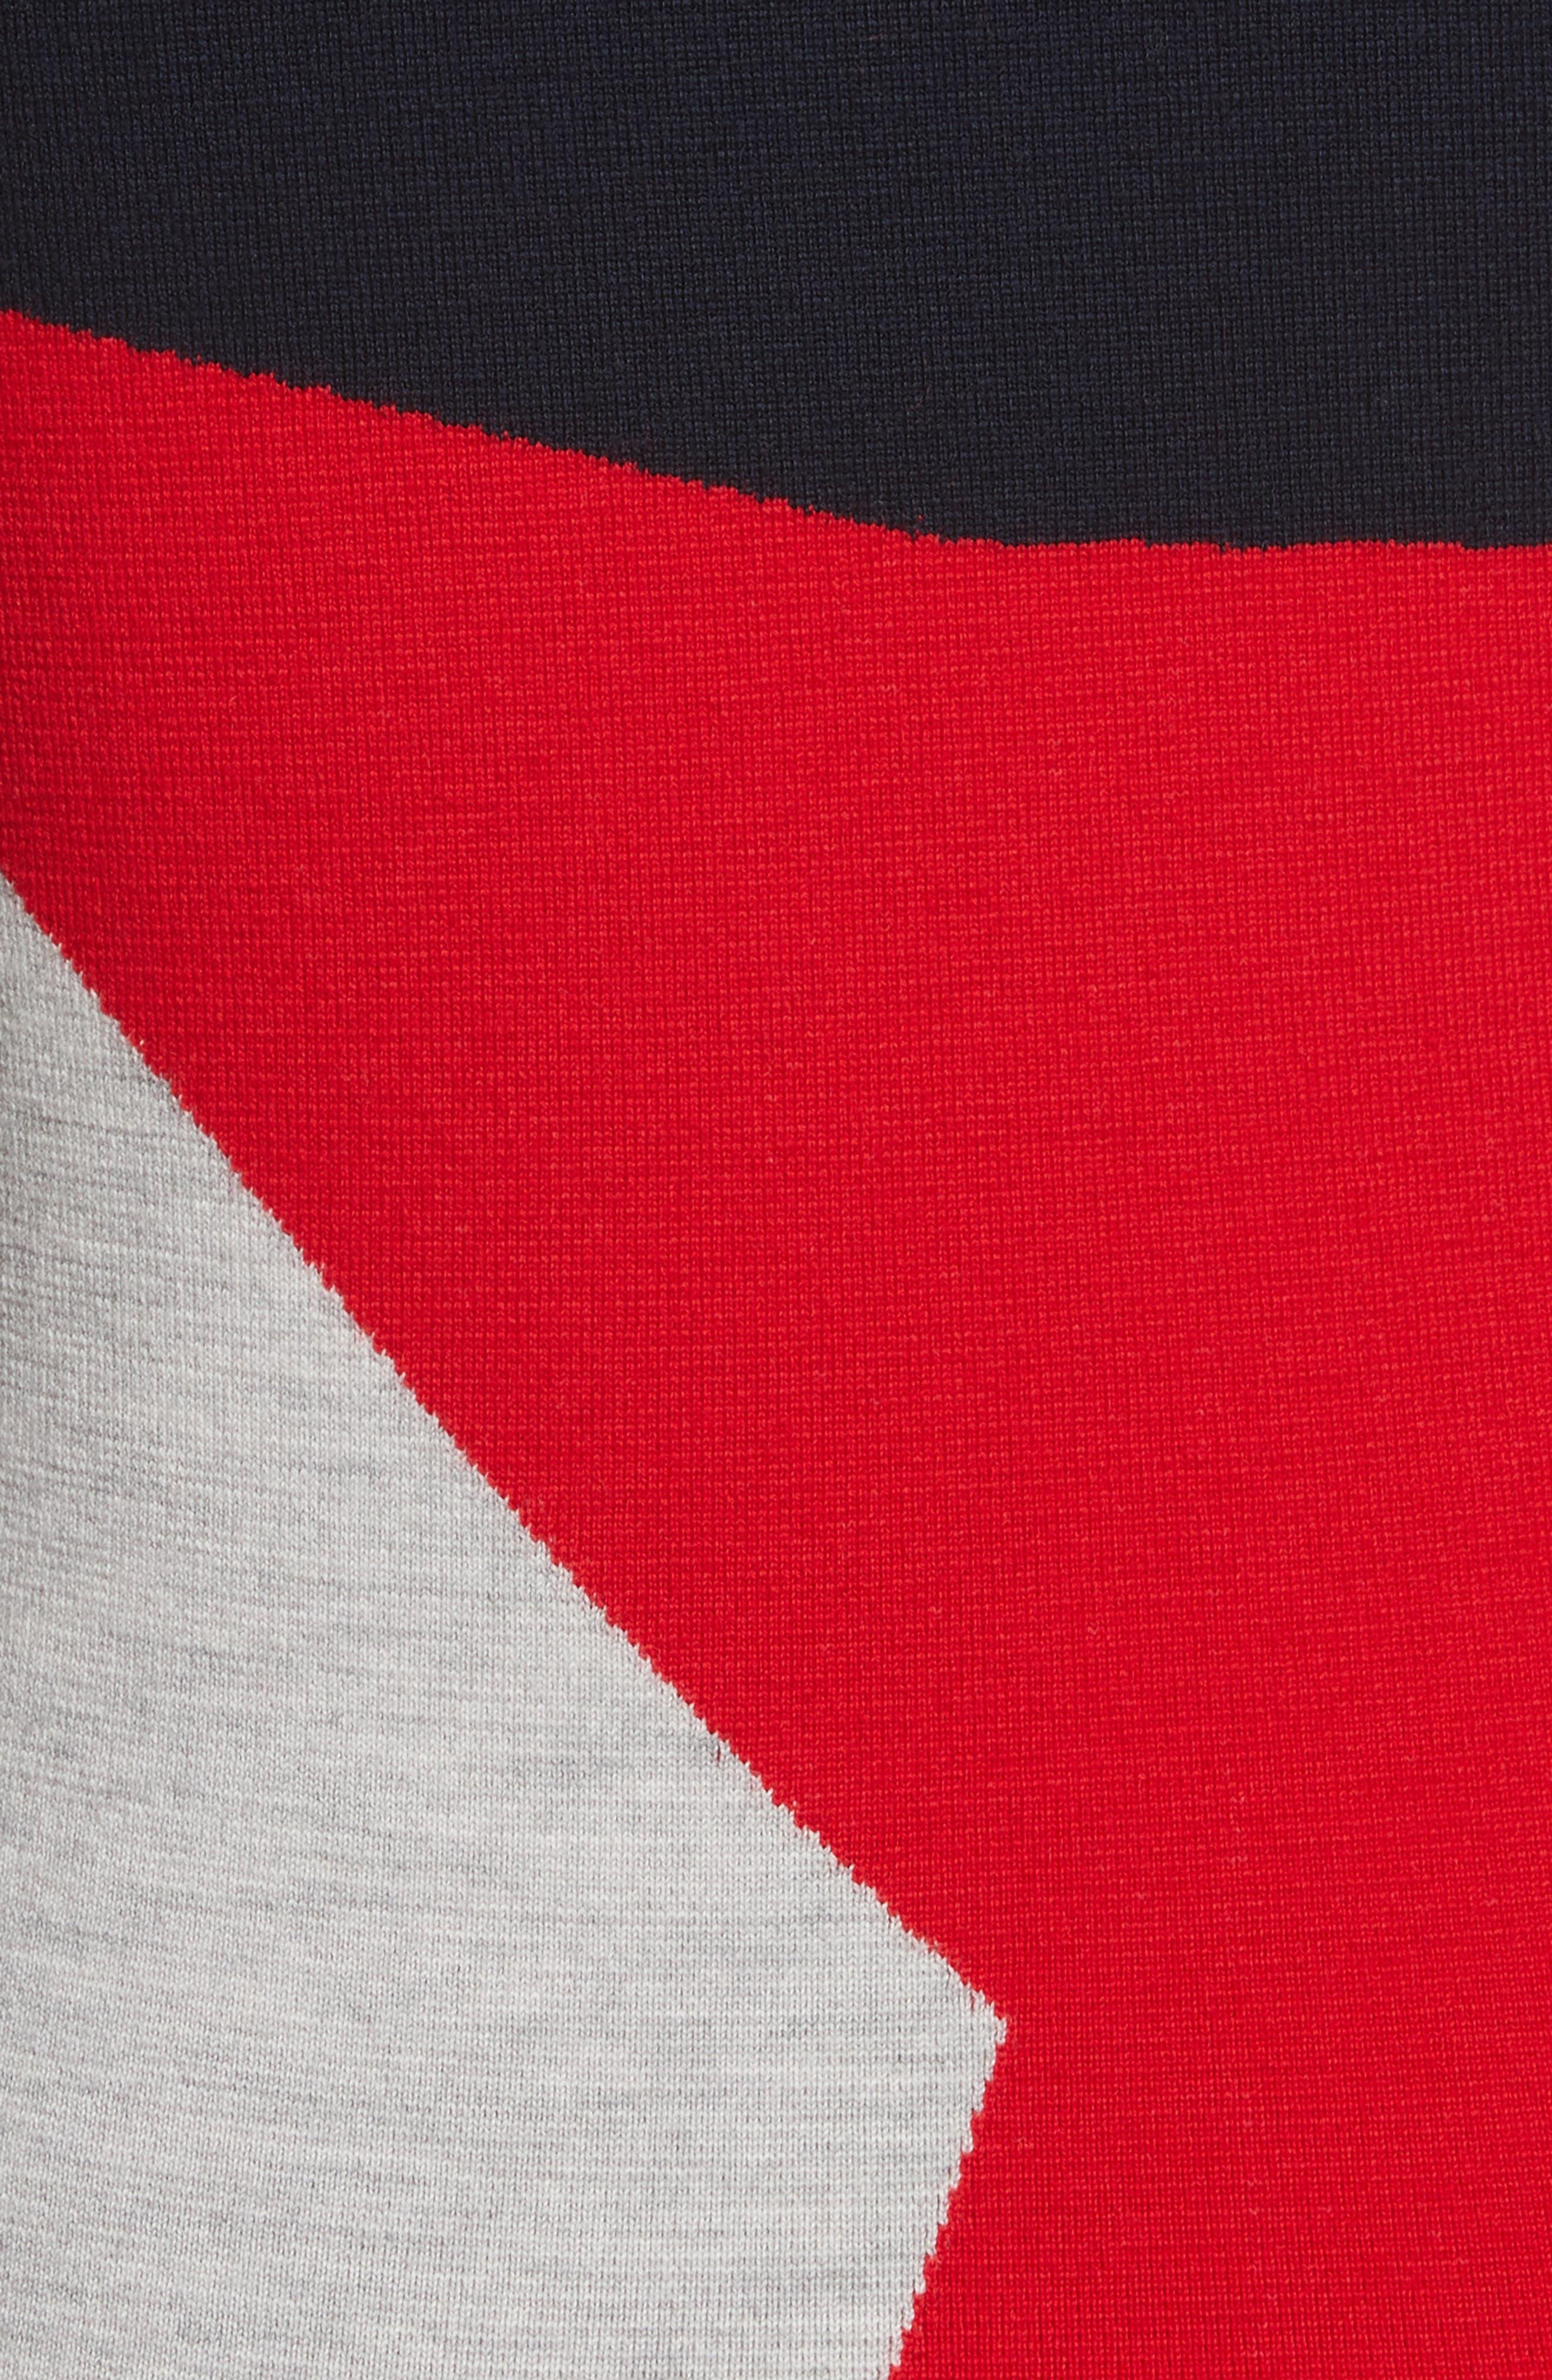 Diane von Furstenberg Colorblock Turtleneck Pullover,                             Alternate thumbnail 5, color,                             642